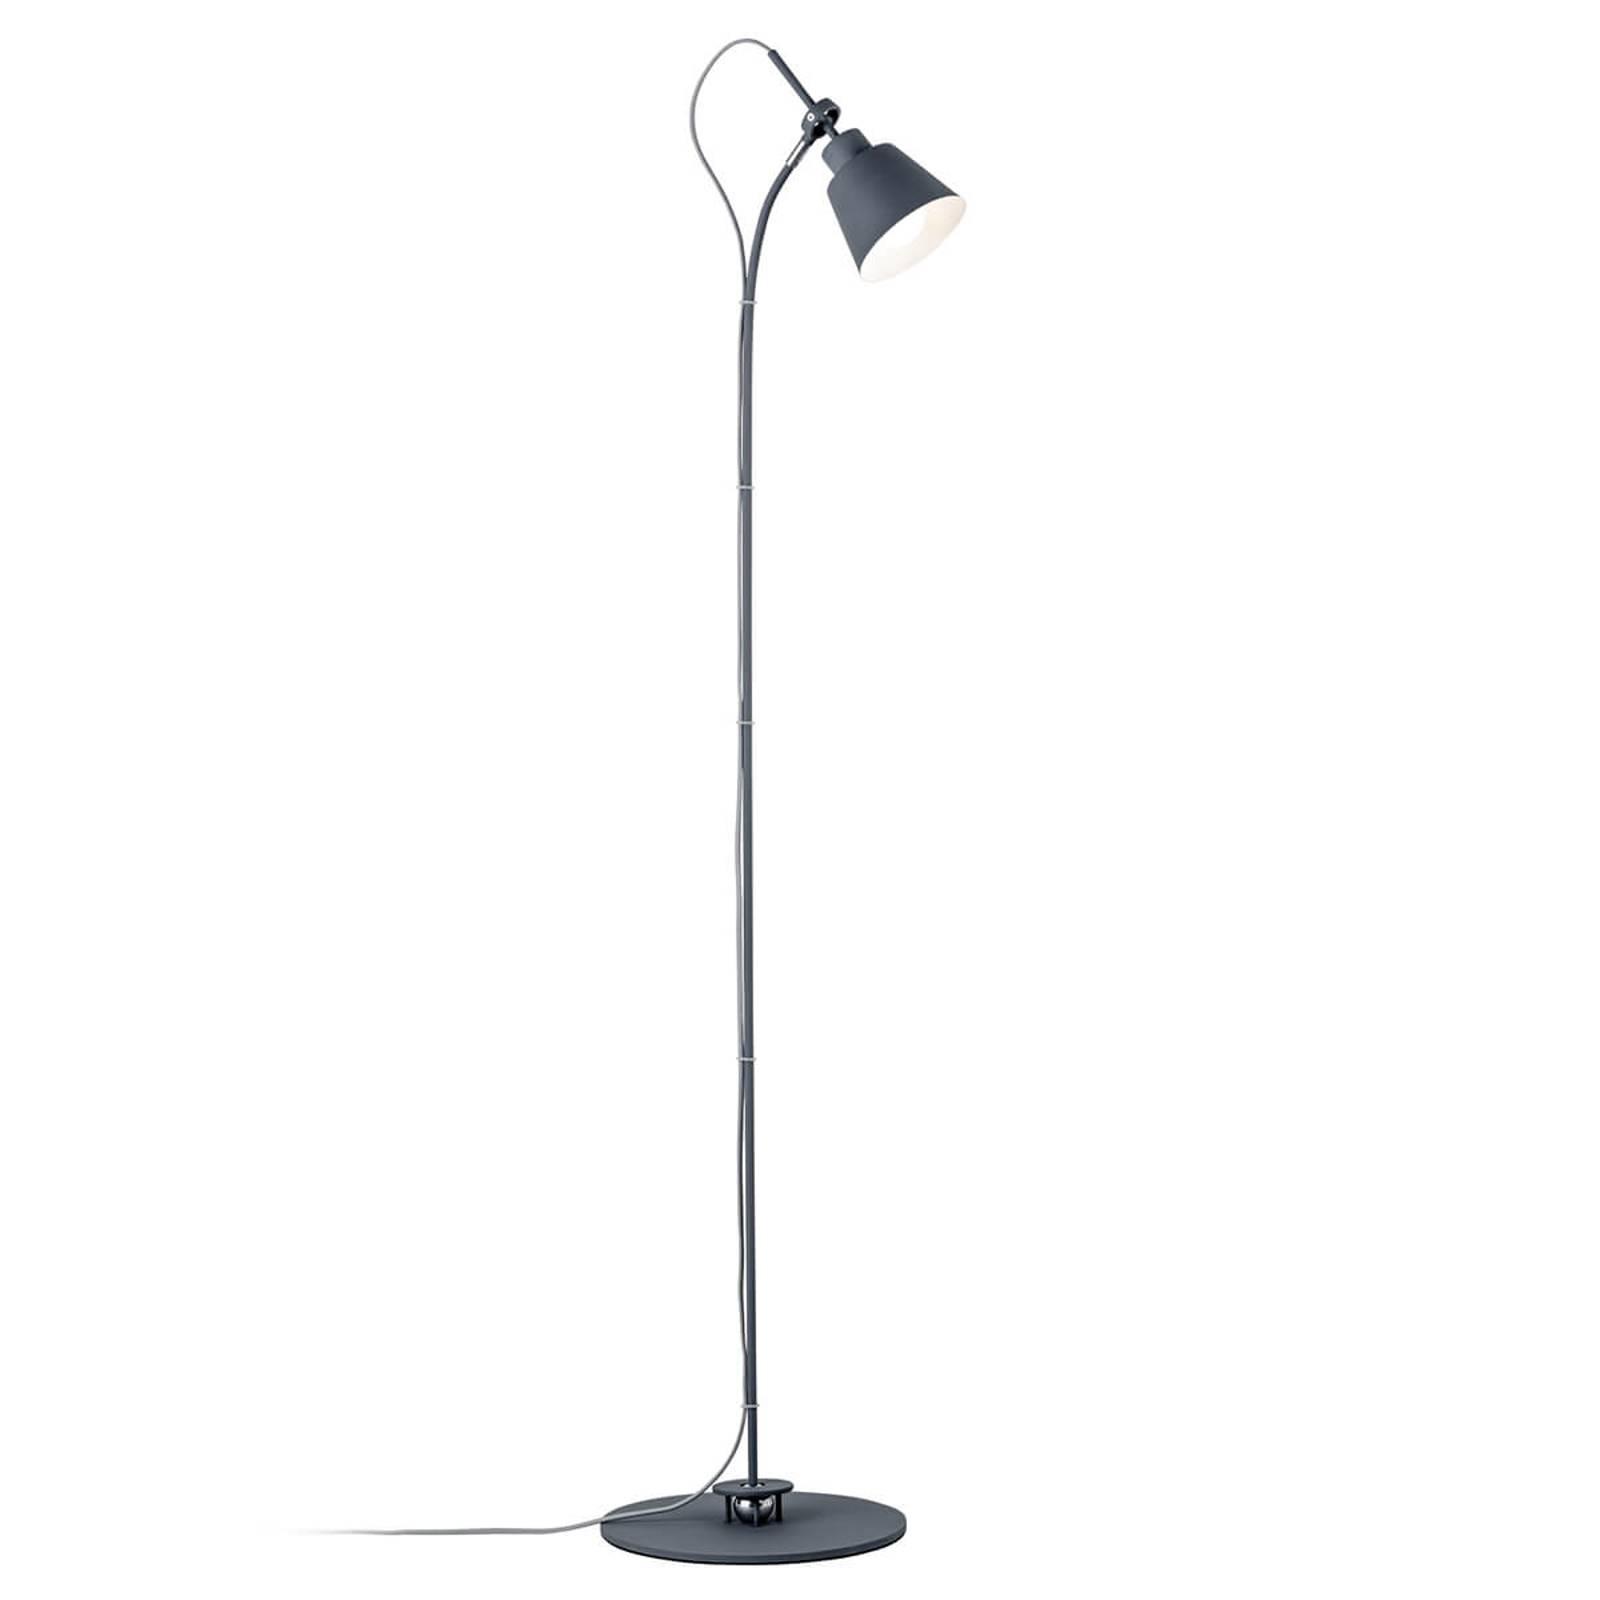 Variabel richtbare vloerlamp Thala